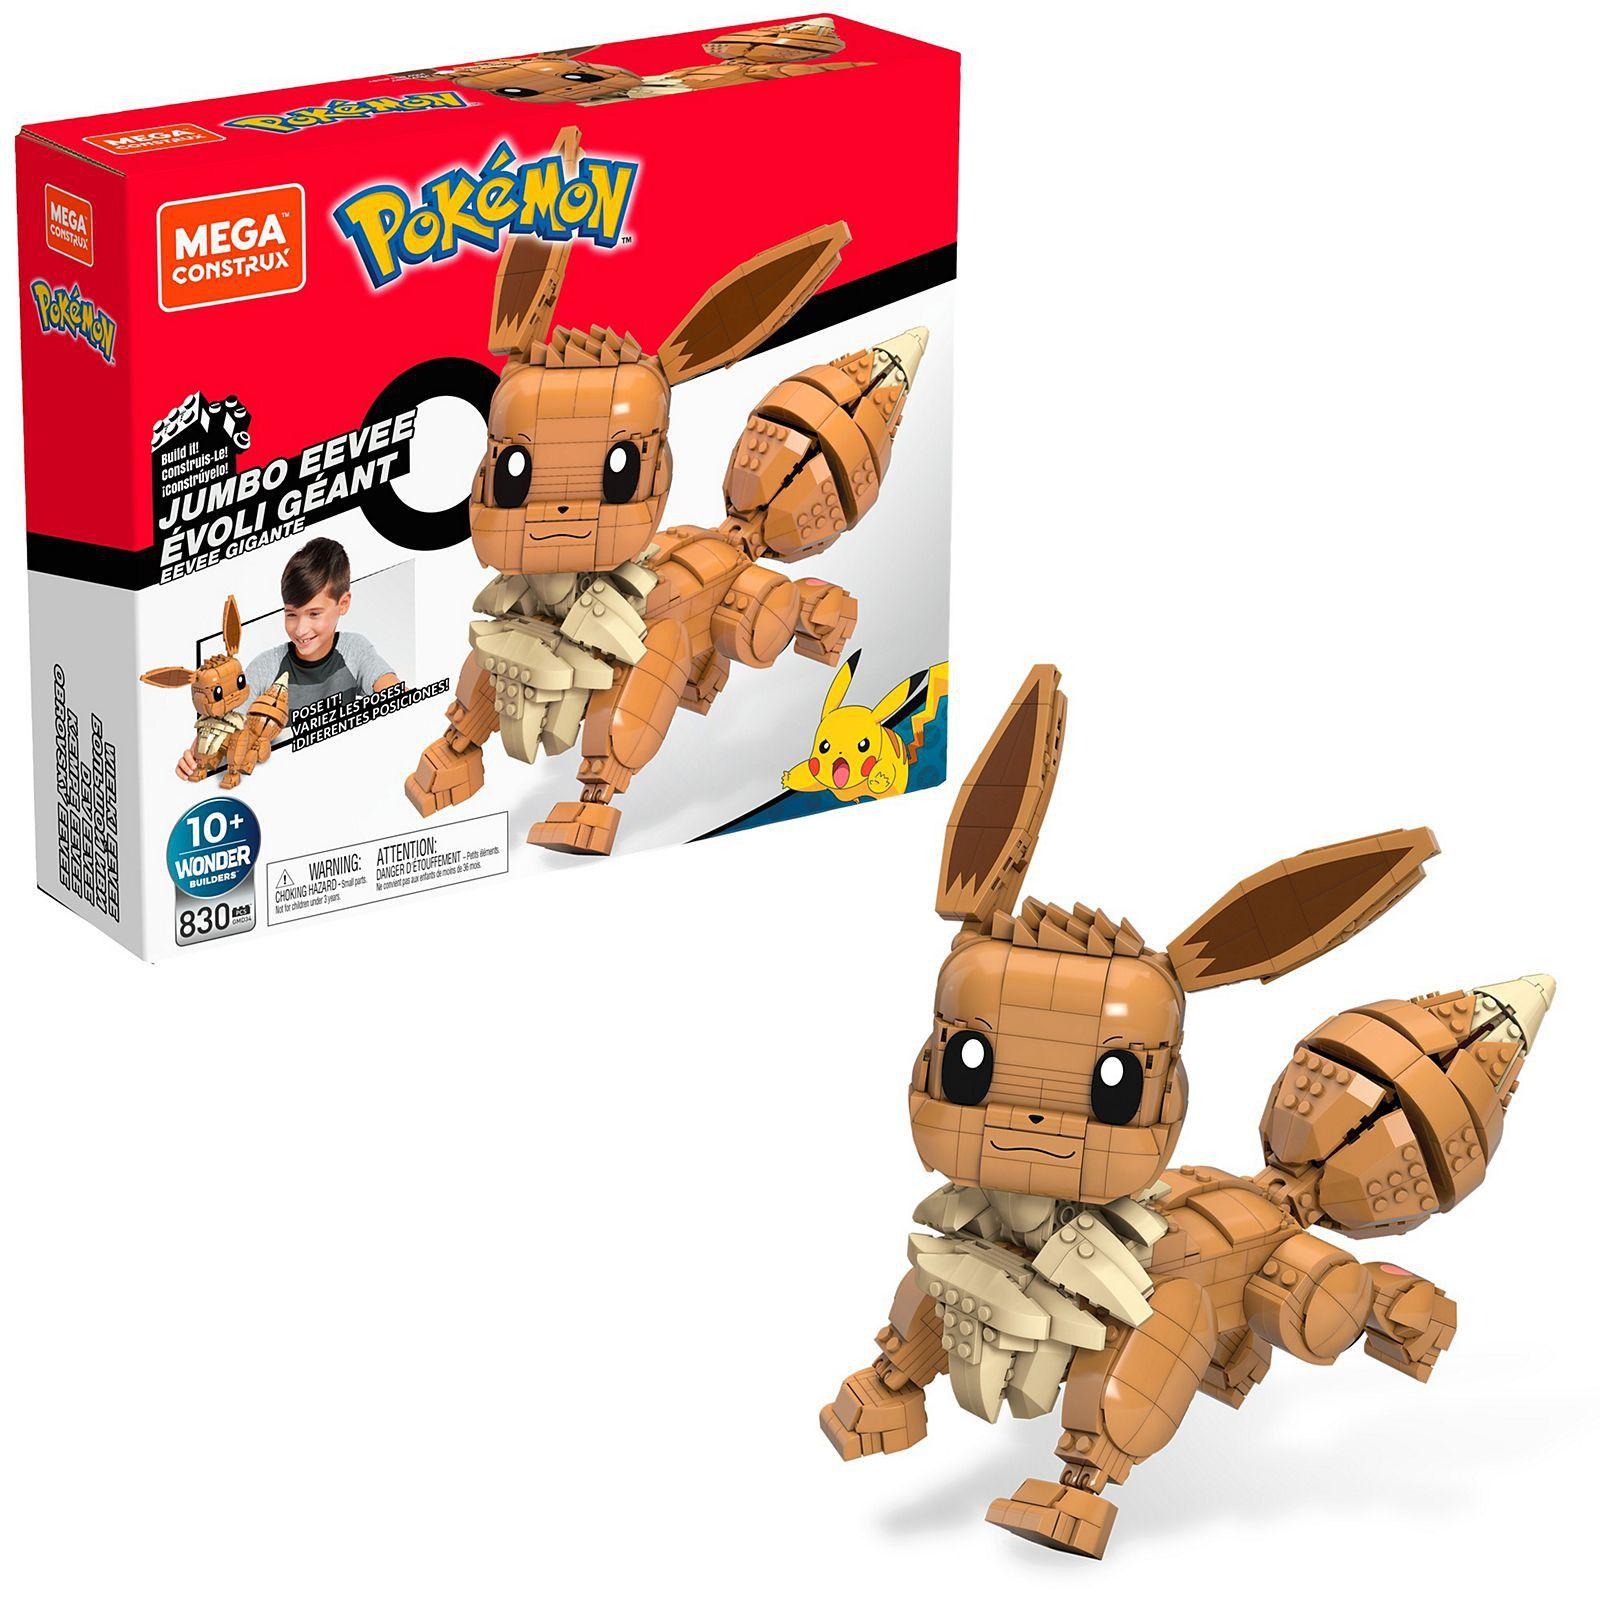 Pokemon - Mega Contrux Jumbo Eevee (GMD34) [Coolshop]